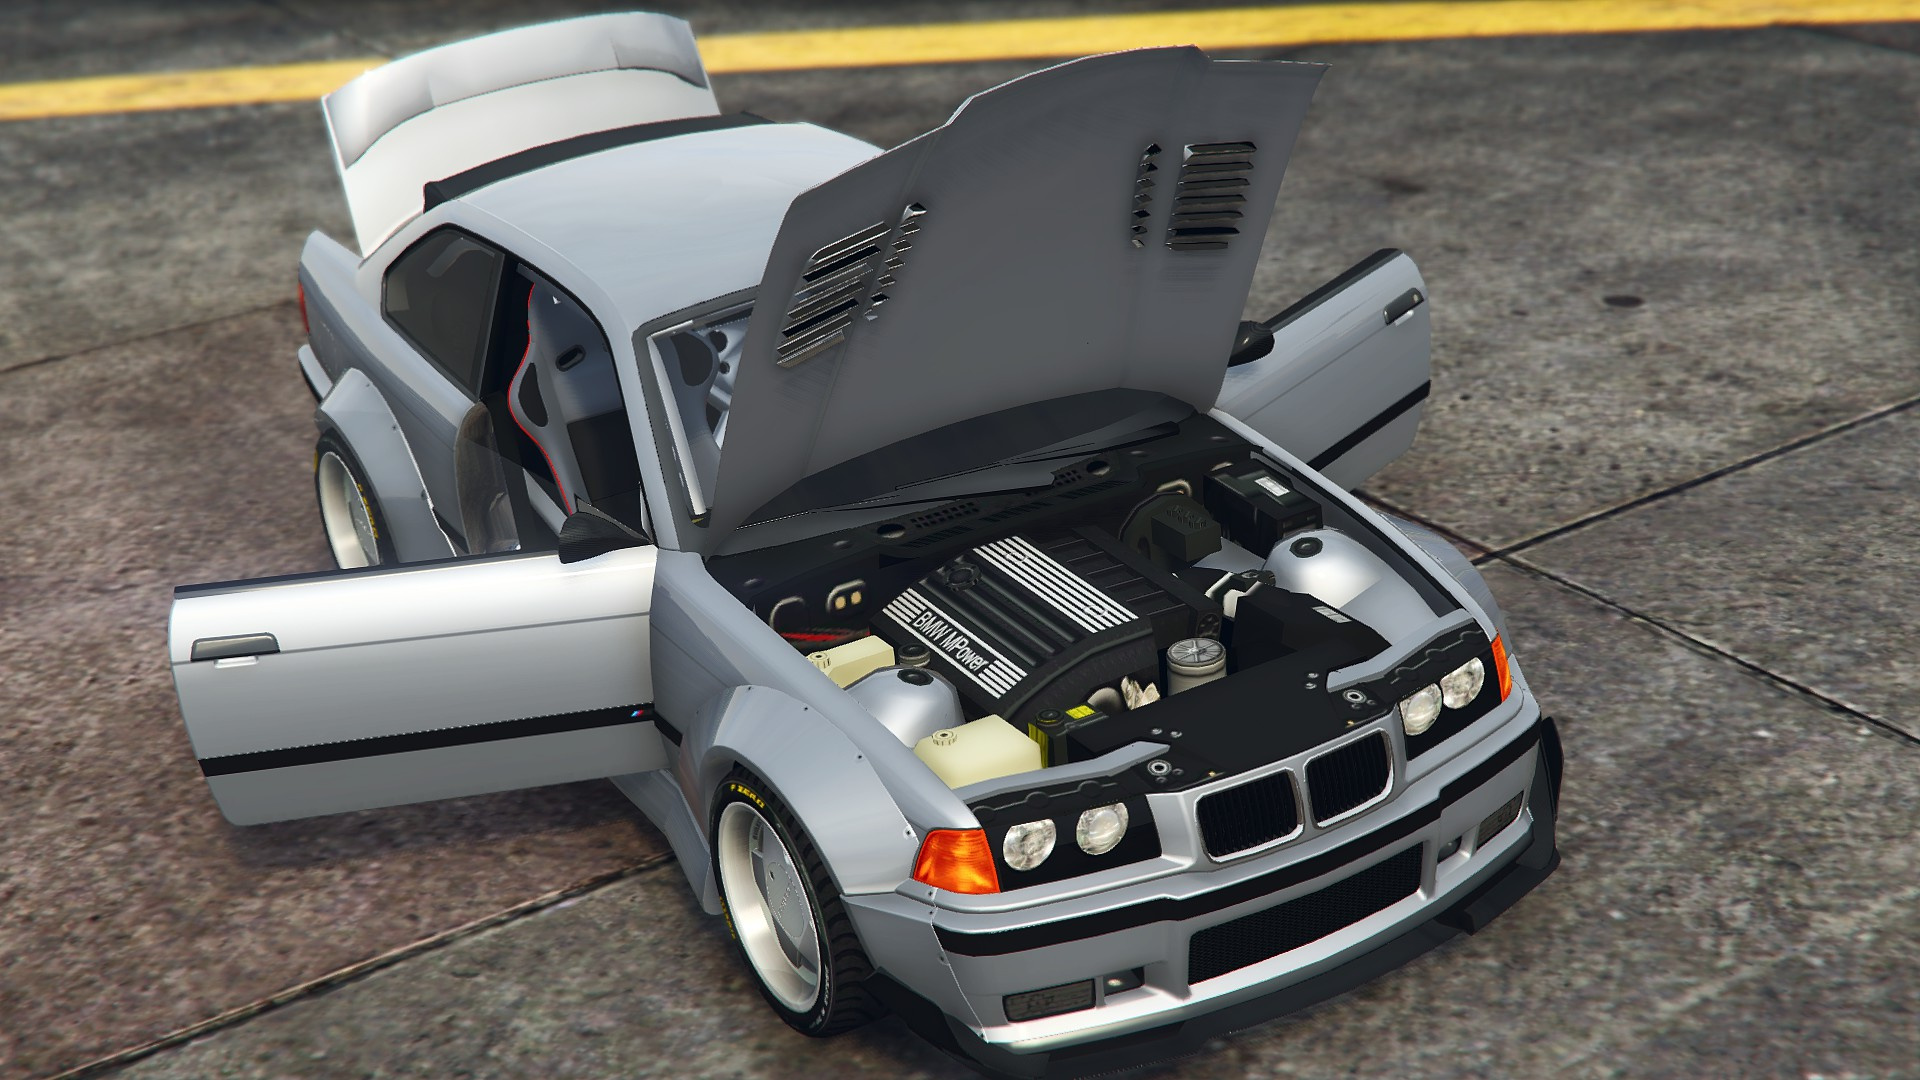 BMW M3 [E36] StreetCustom [Add-On | Tuning] - GTA5-Mods.com